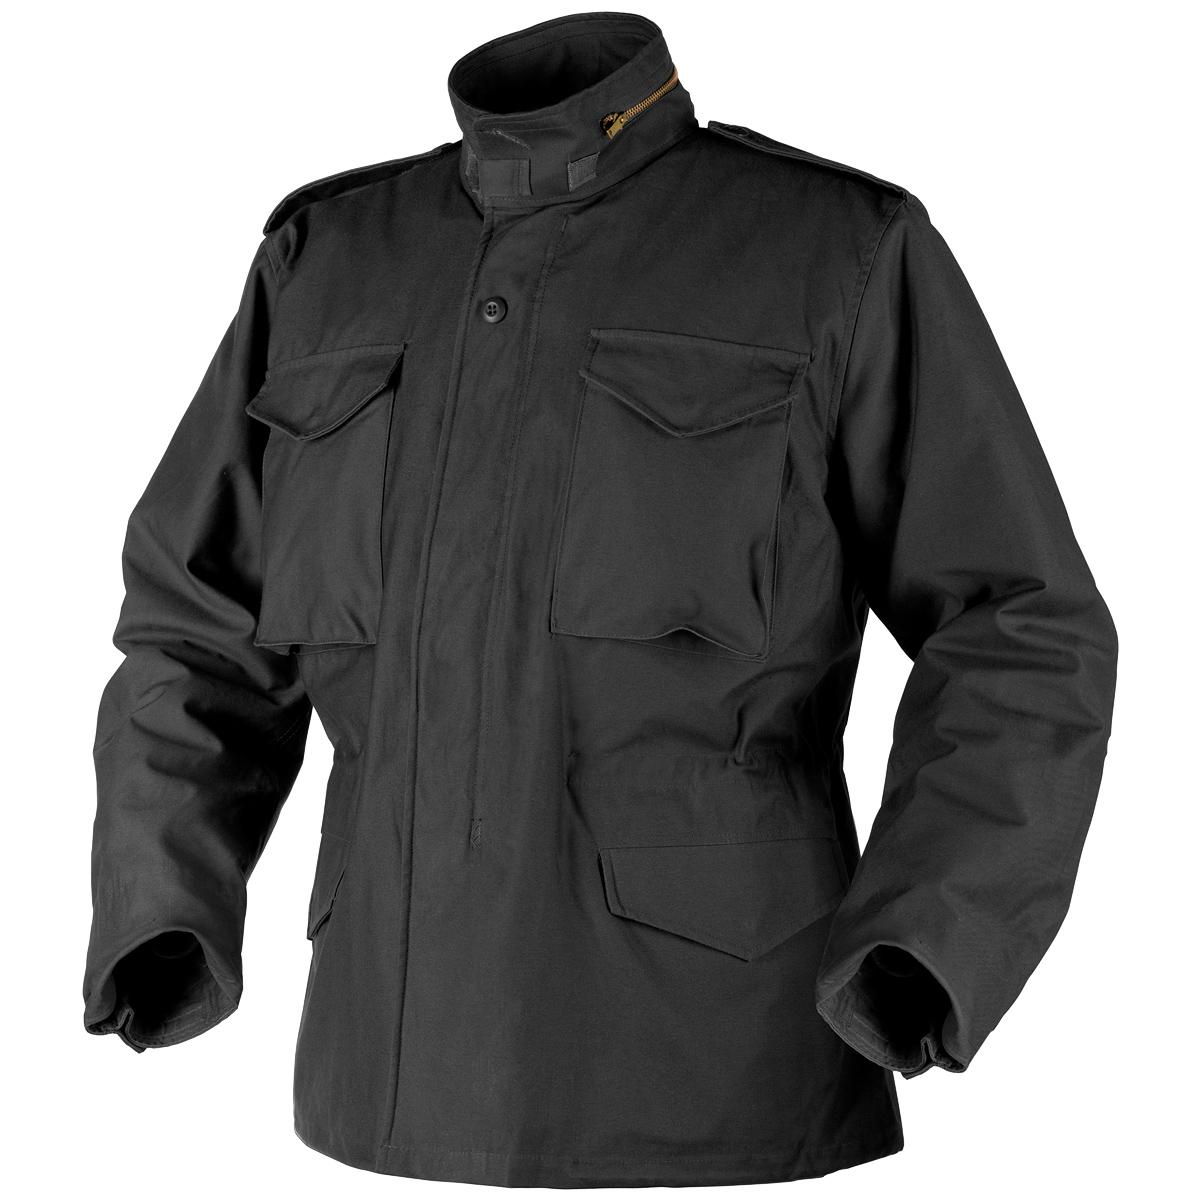 Helikon Genuine M65 Army Field Jacket Military Hooded Coat Original Black S-3XL | EBay